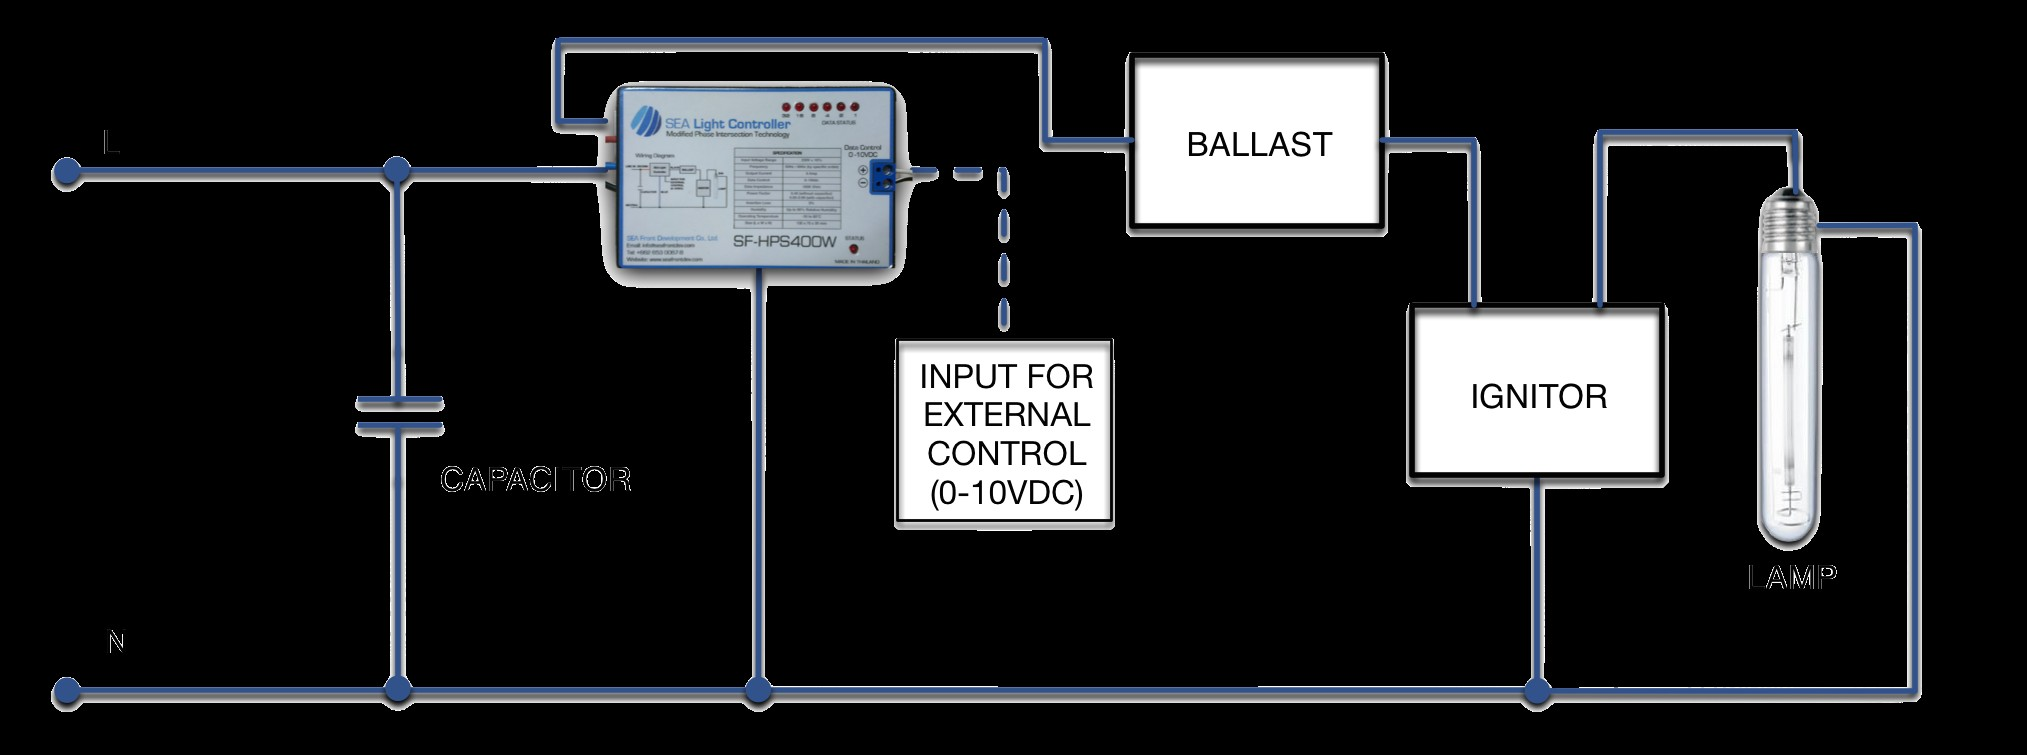 High Pressure Sodium Ballast Wiring Diagram WIRING DIAGRAM